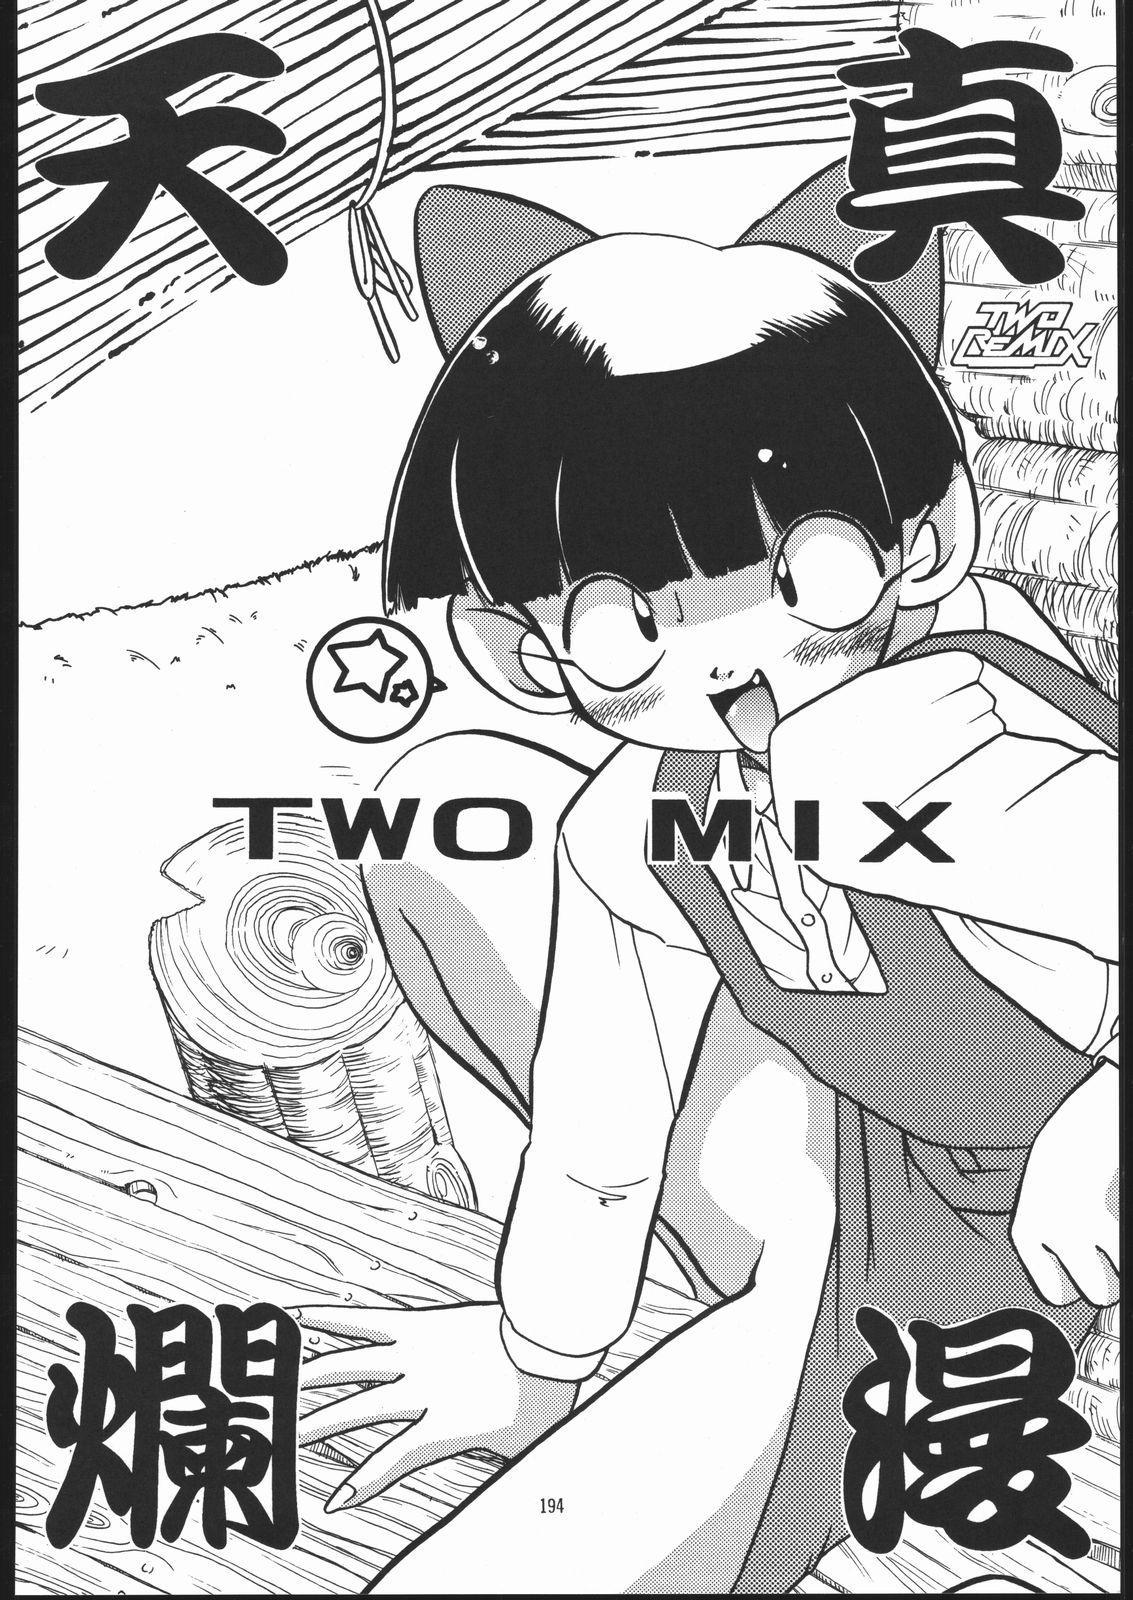 TWO REMIX 192